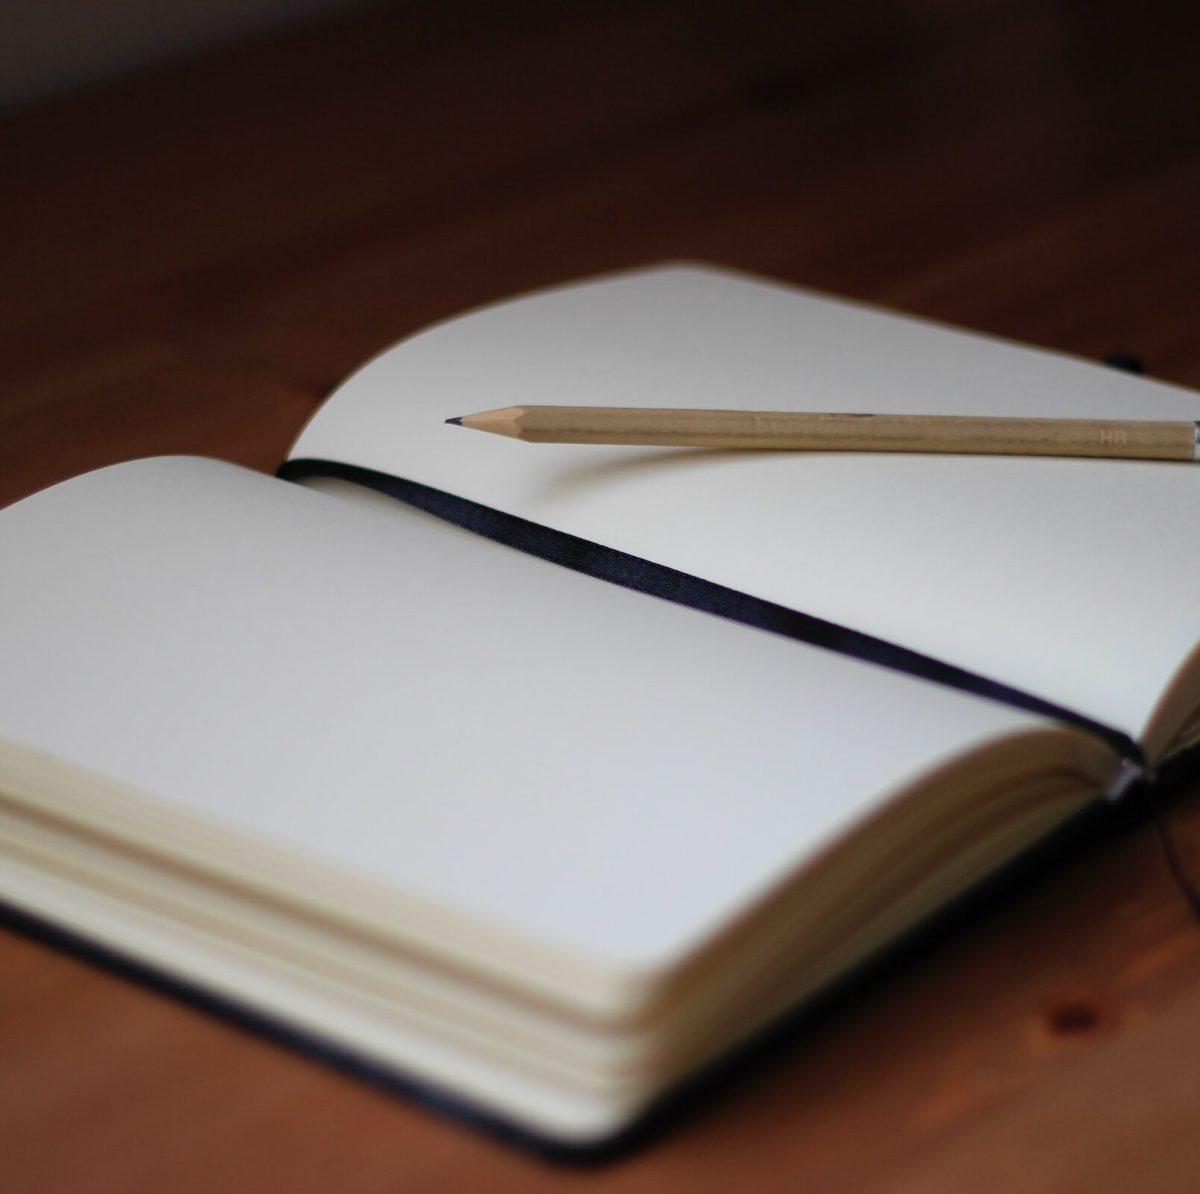 old notebooks out of context sentences Photo by jan kahanek on Unsplash